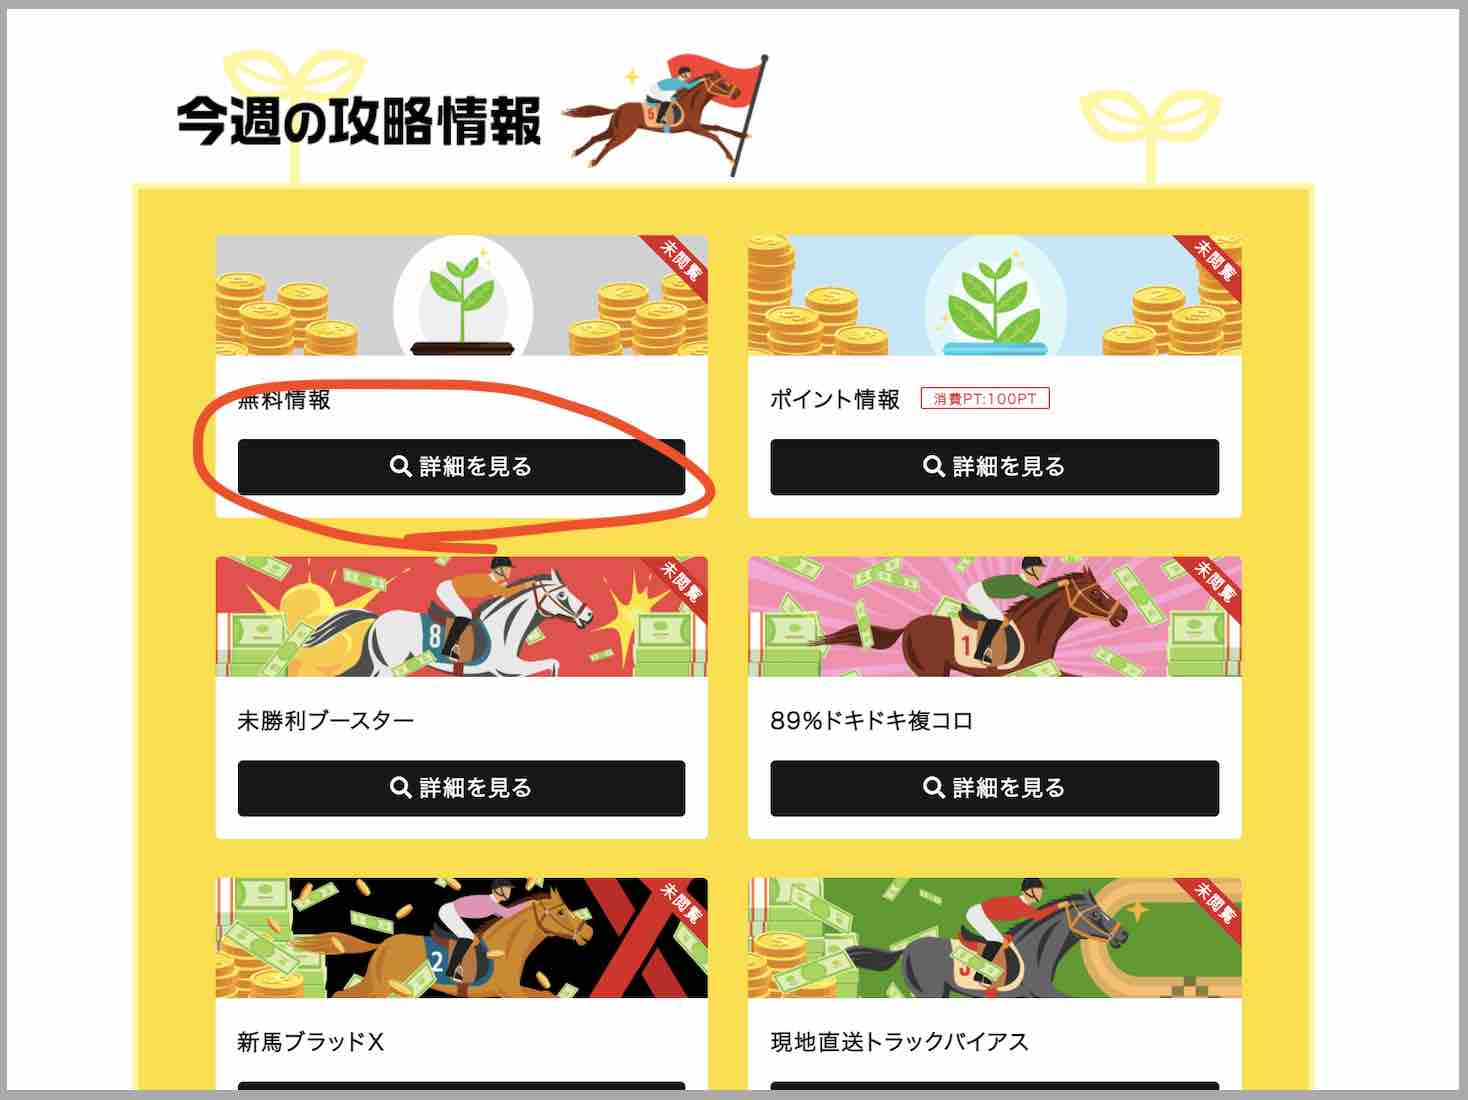 eco競馬(エコ競馬)という競馬予想サイトの無料予想(無料情報)の場所という競馬予想サイトの無料予想(無料情報)を確認する